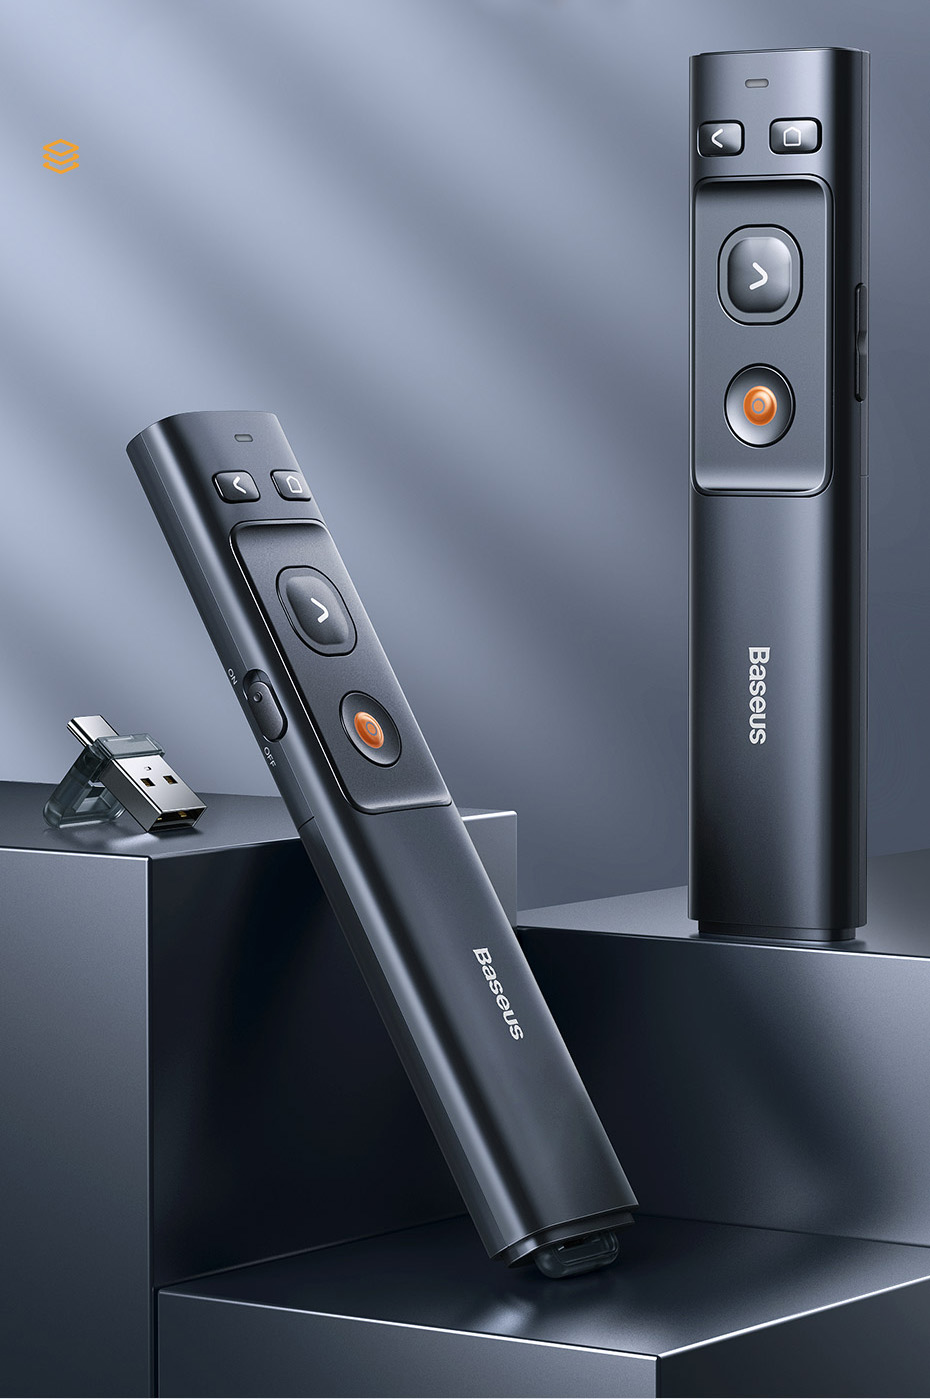 Baseus Orange Dot Wireless Presenter 5